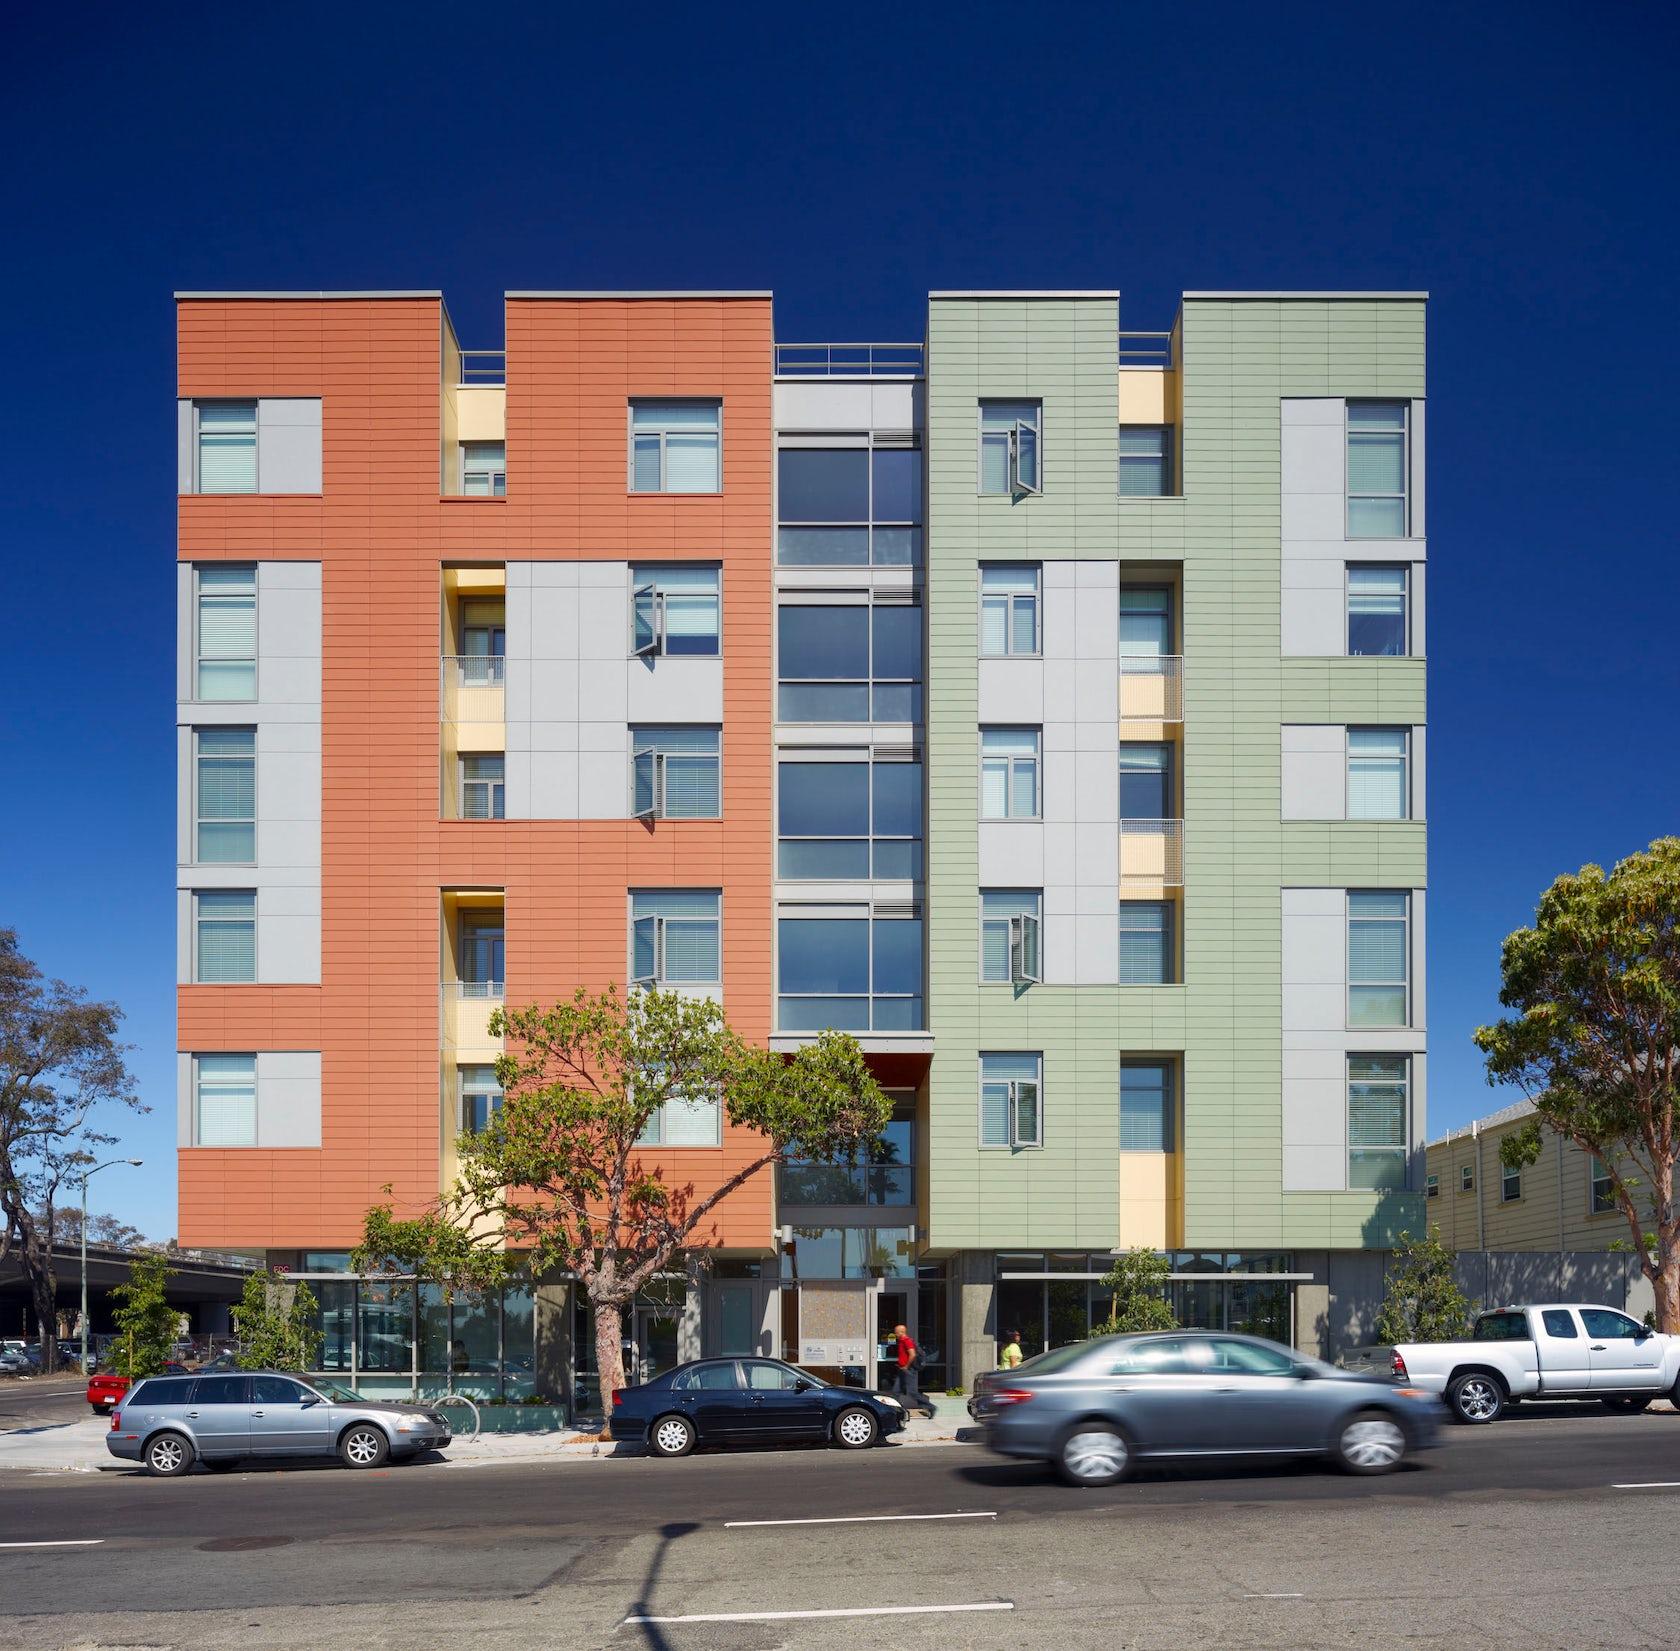 Merritt Crossing Senior Apartments